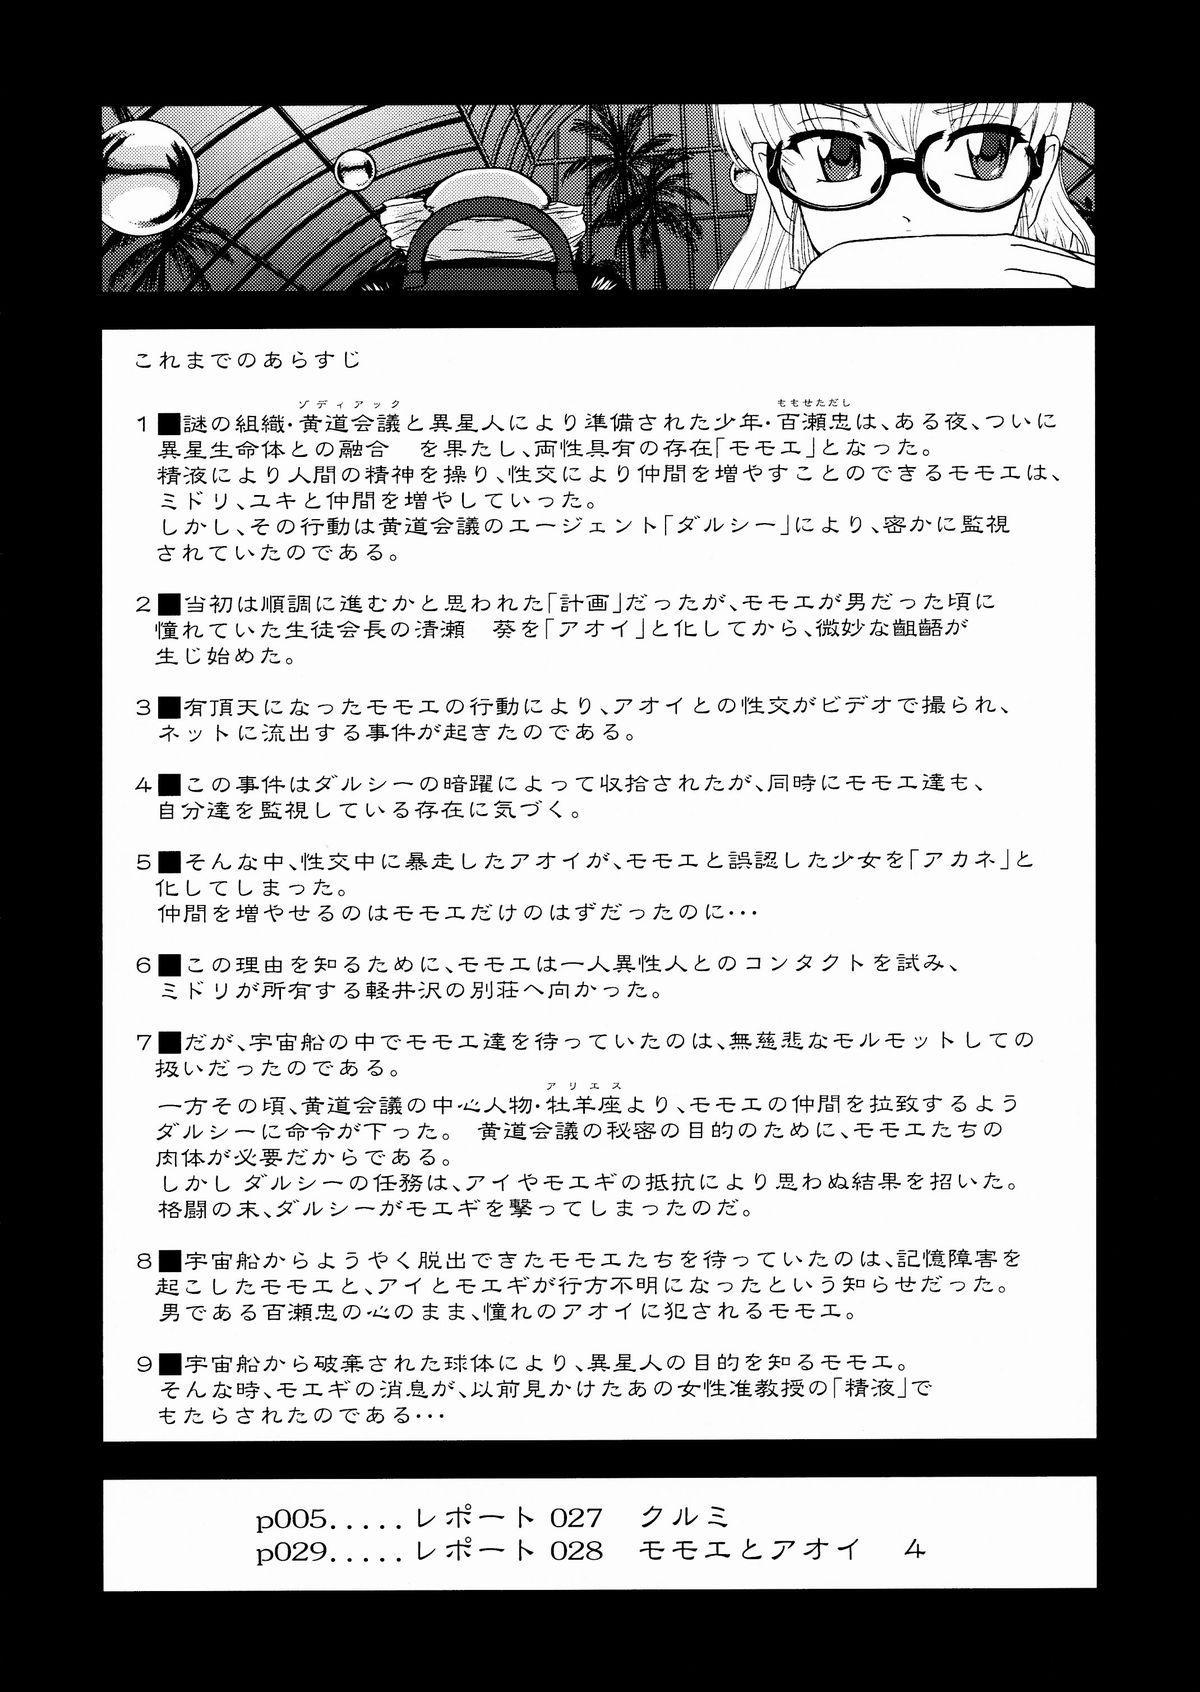 Dulce Report 10 2